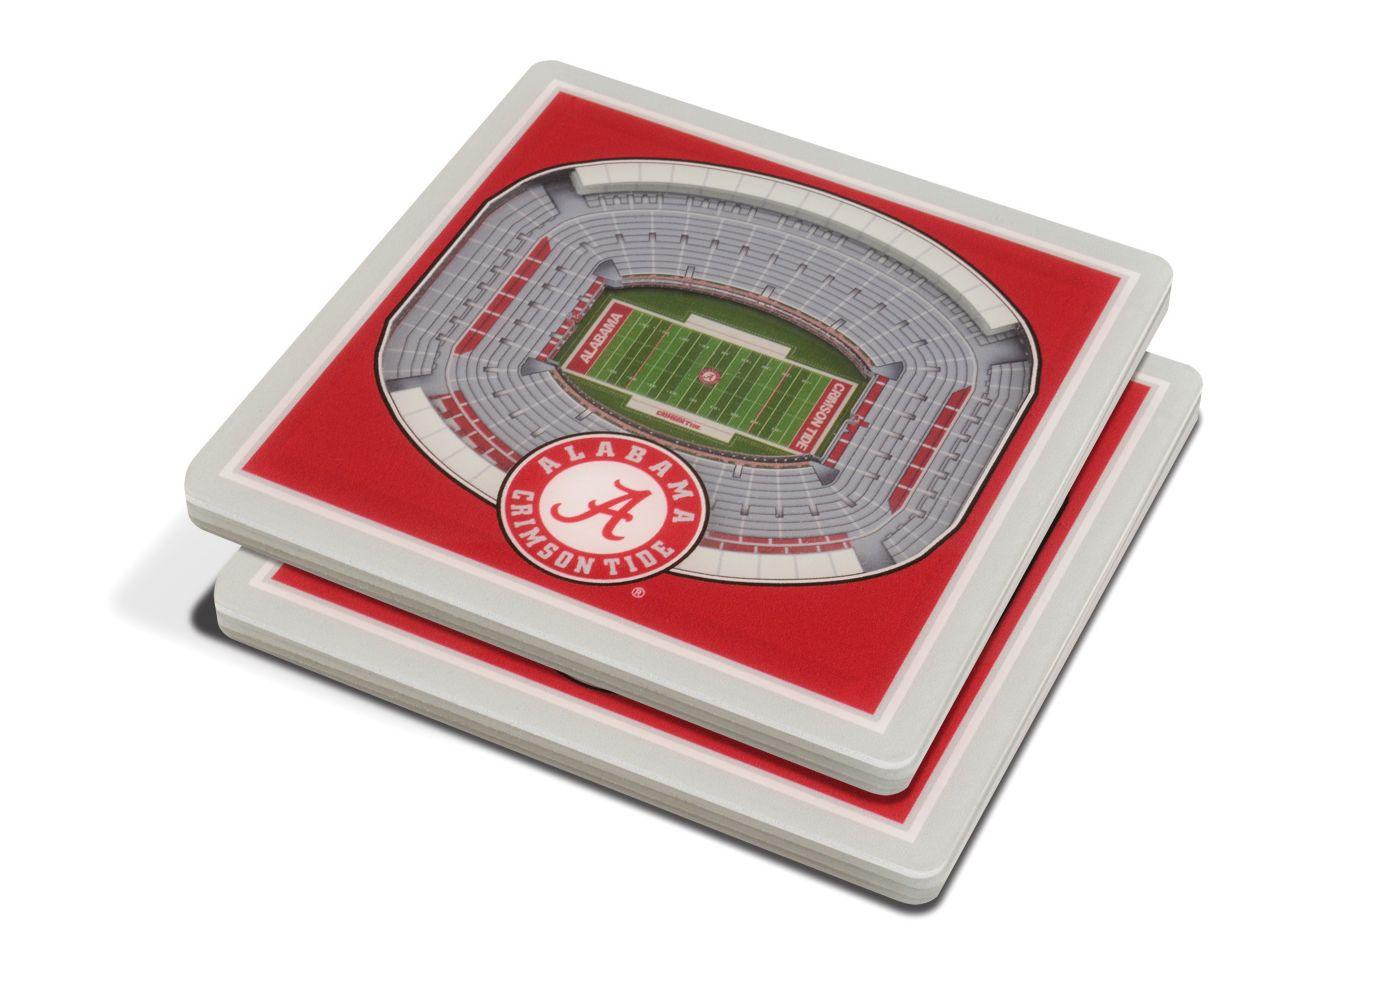 You the Fan Alabama Crimson Tide 3D Stadium Views Coaster Set